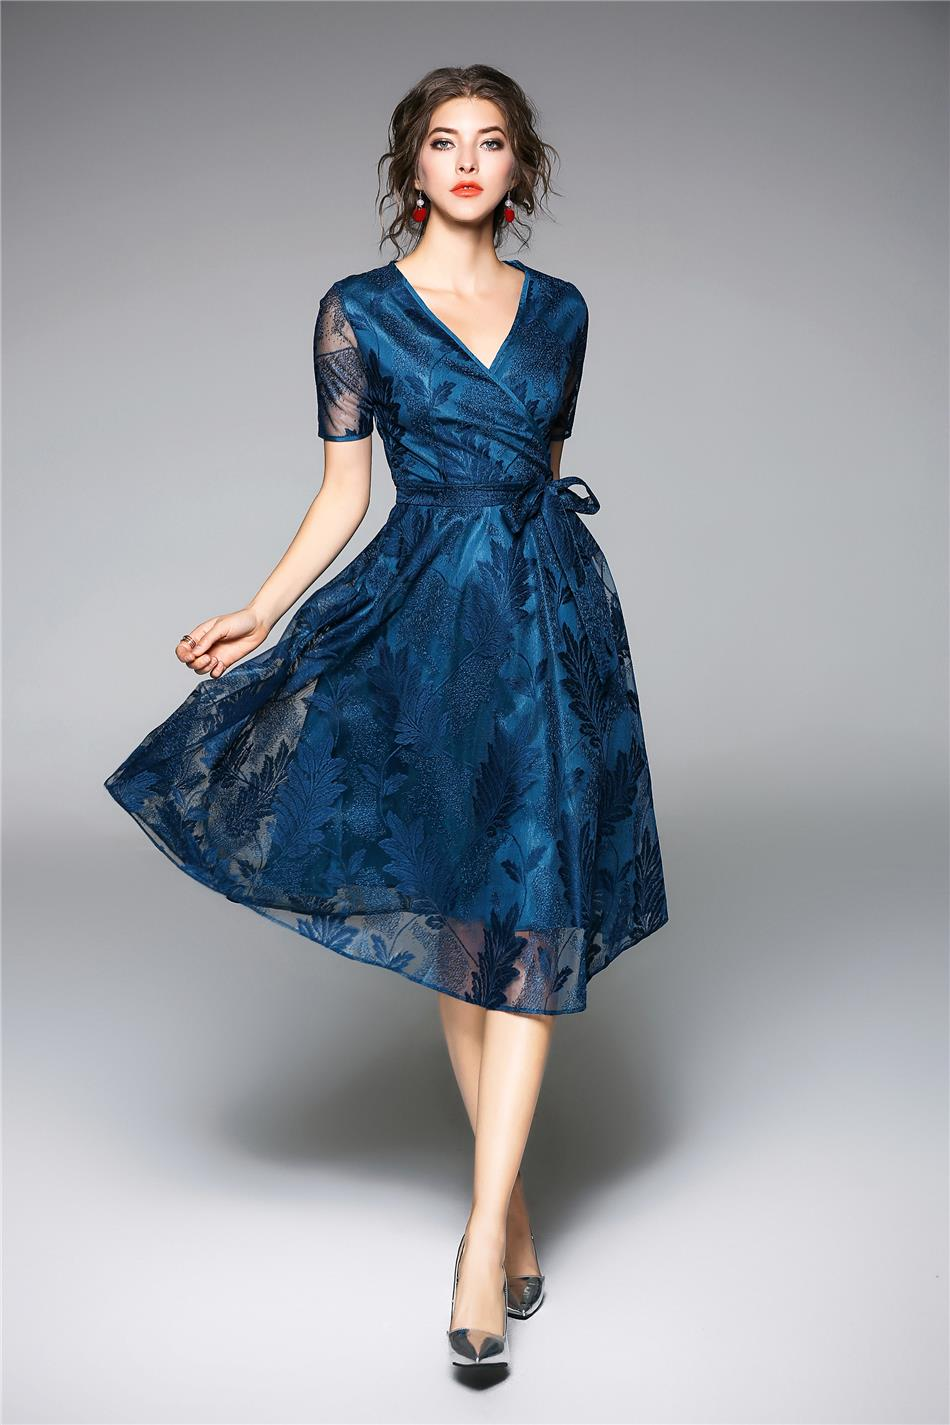 Bayan  elbise  ,dantel elbise,elbise modelleri,ucuz elbise,elbise saın al